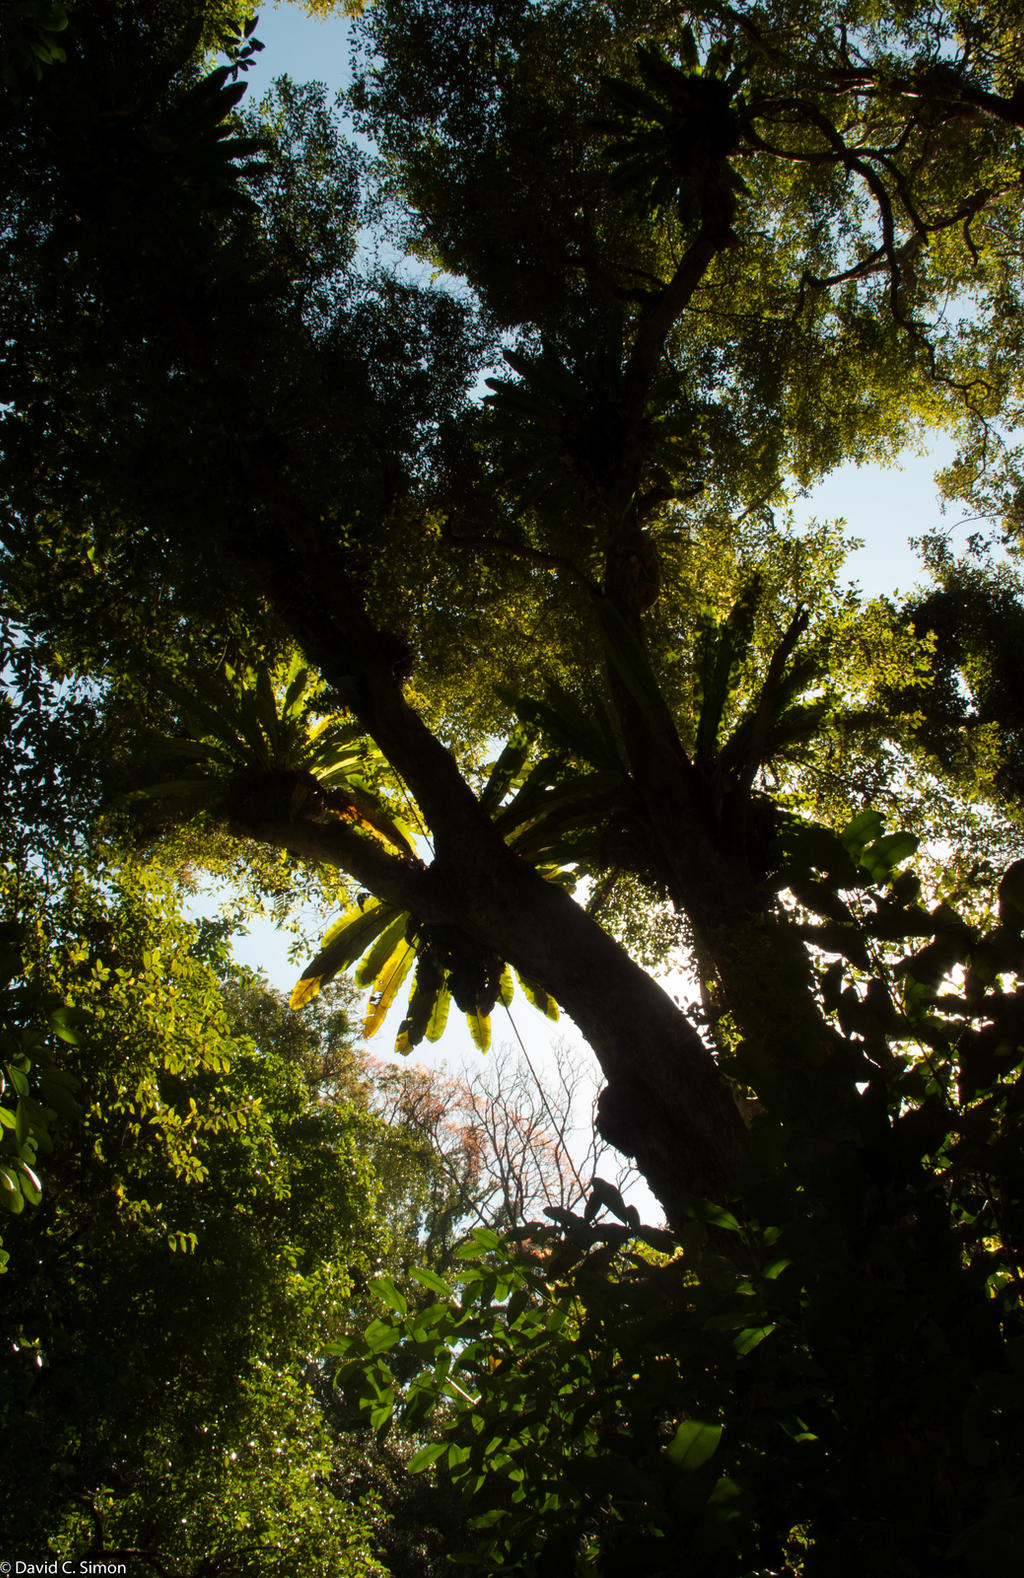 Birds Nest Ferns